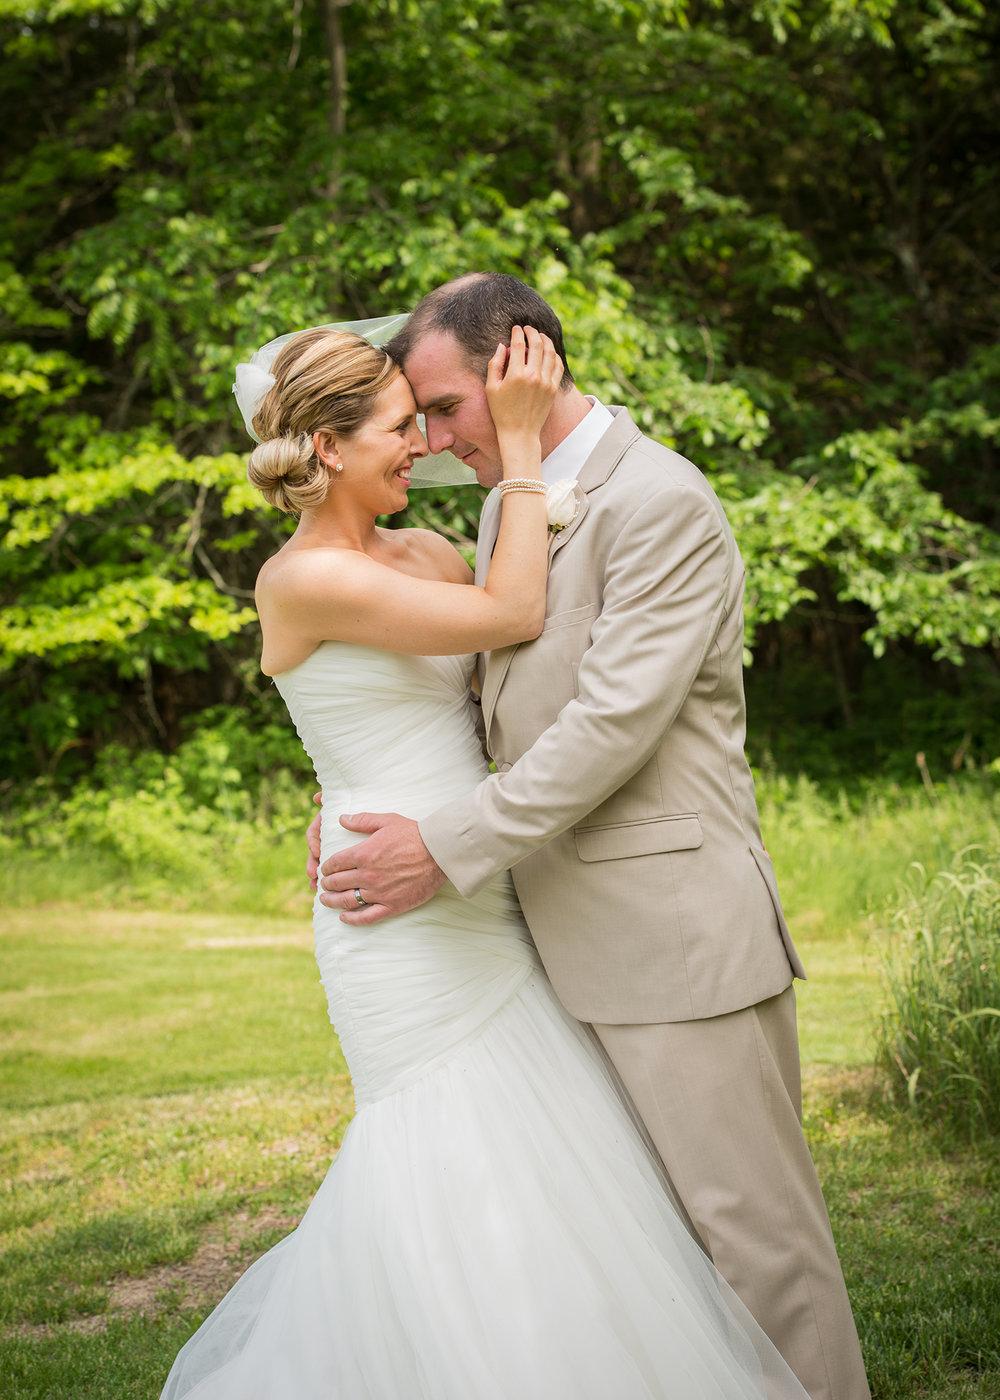 DRG-PHOTO-WEDDING-SCOTT-31.jpg